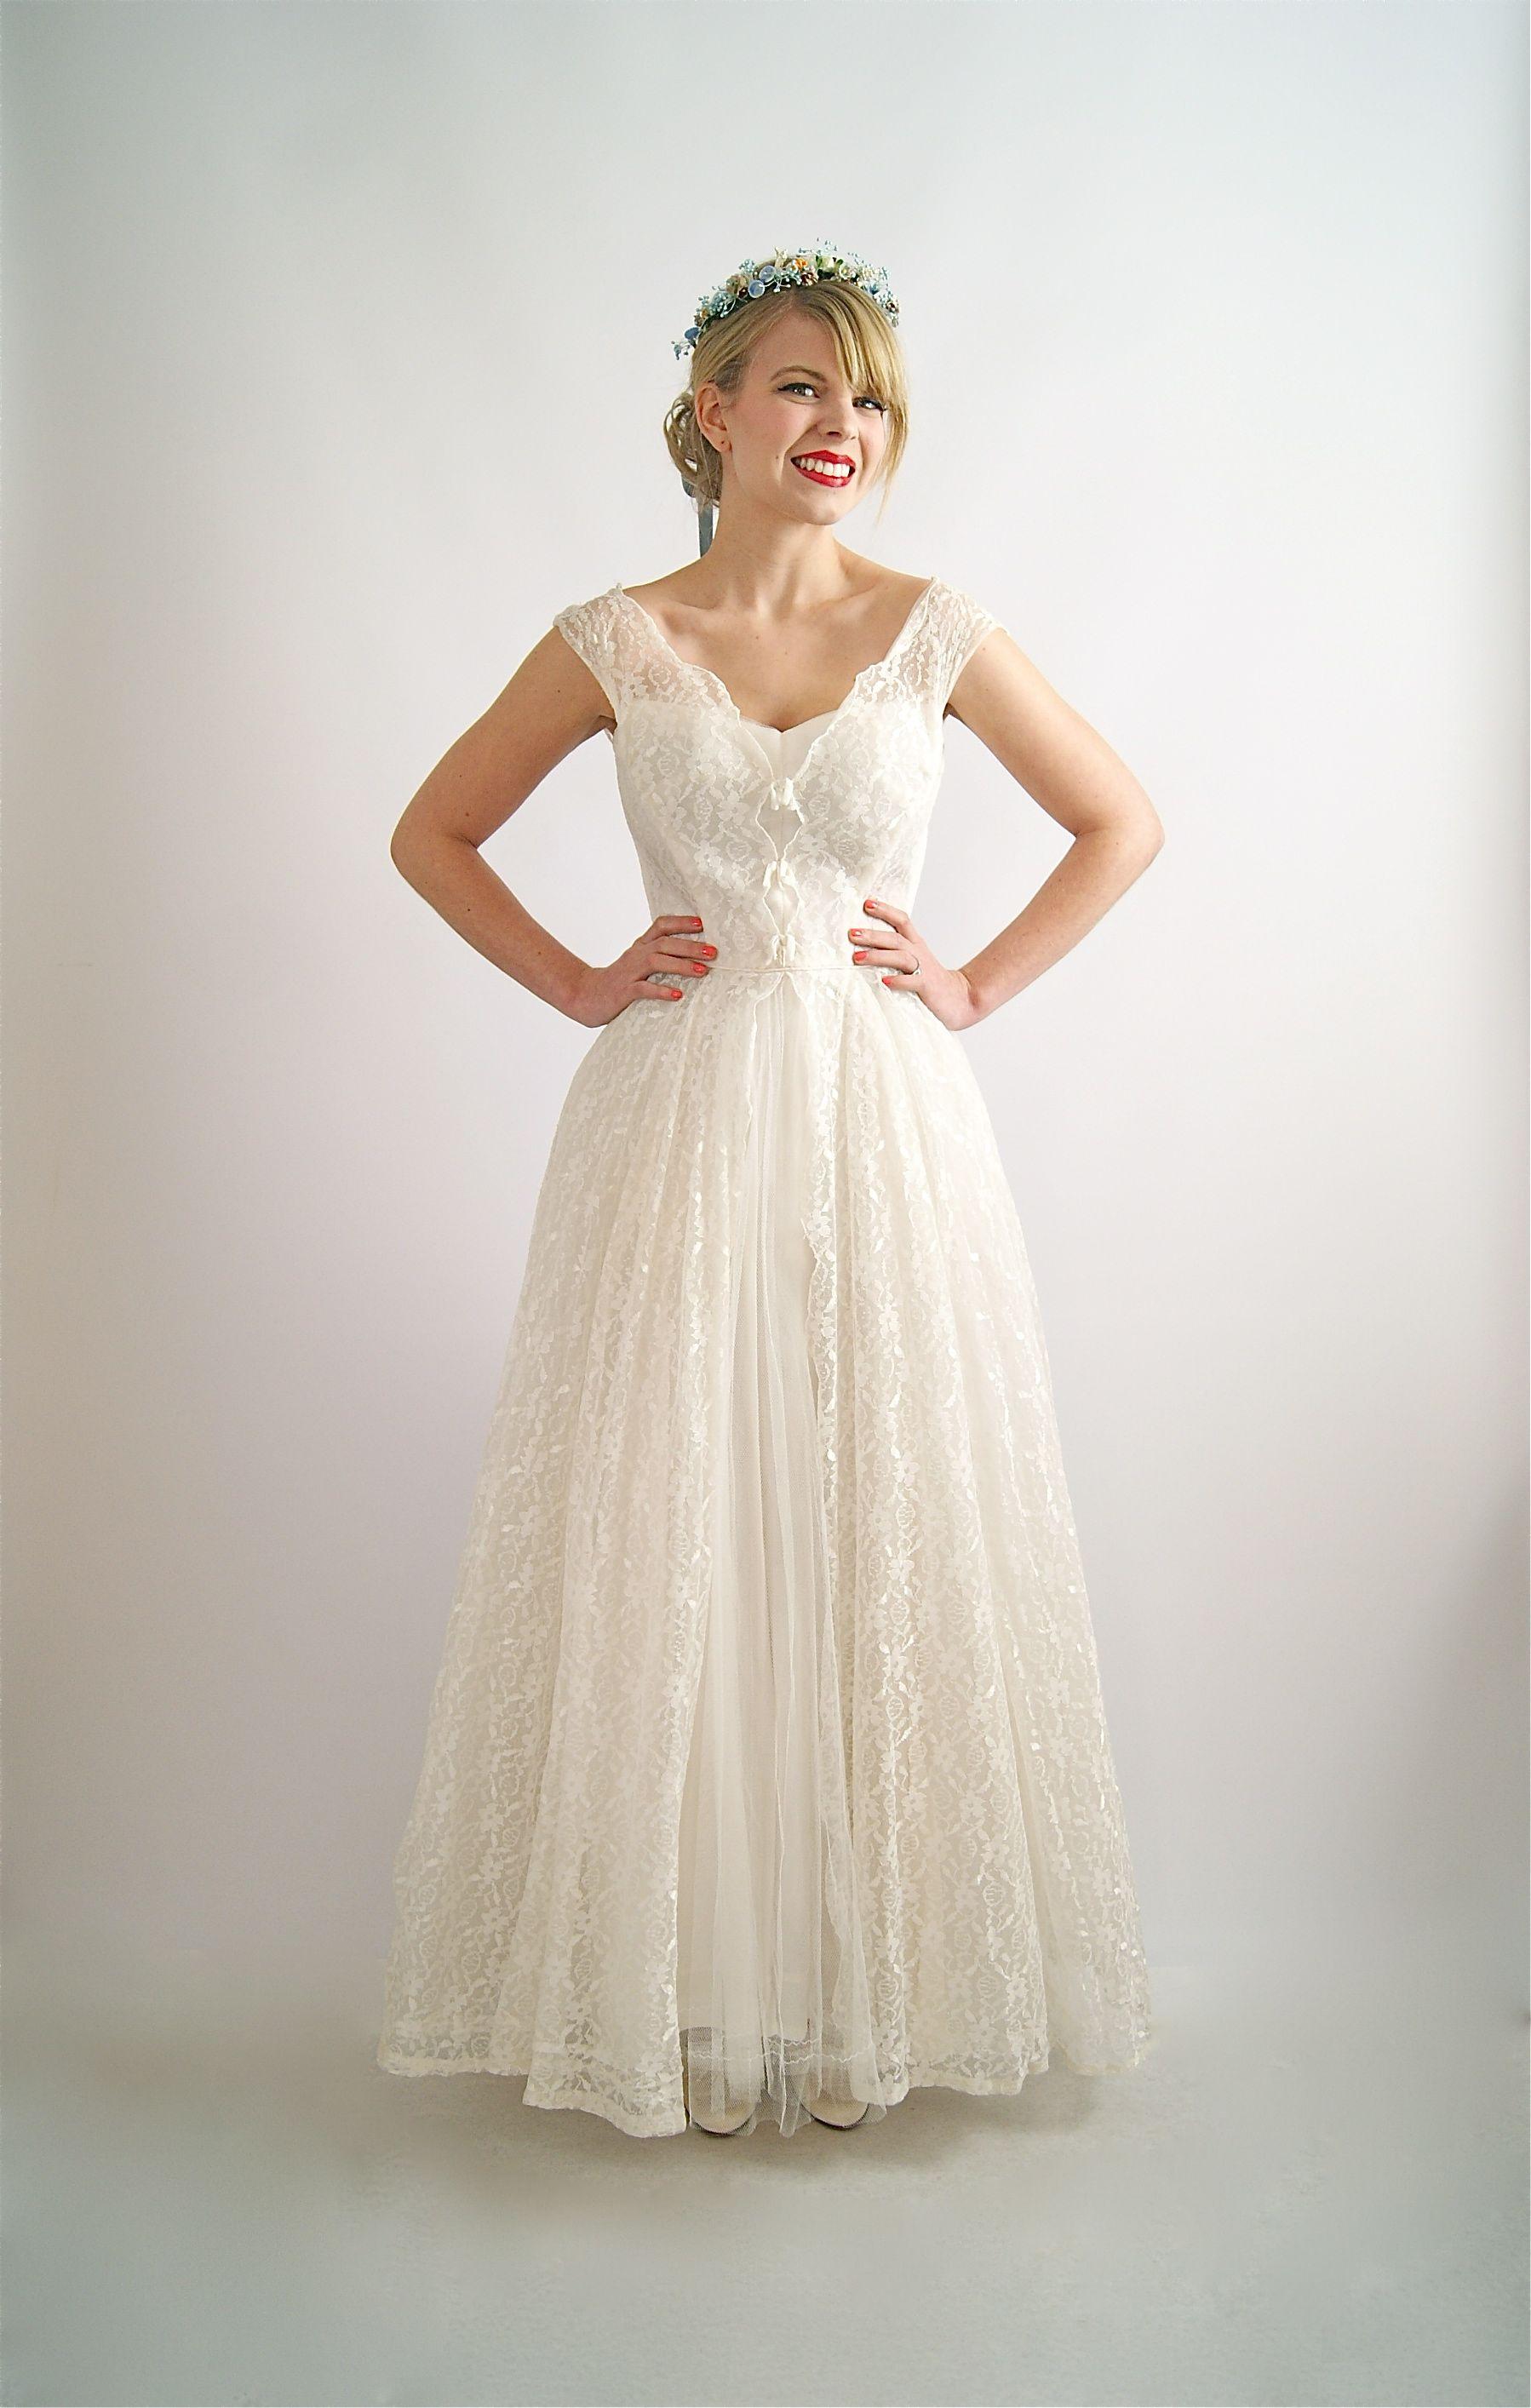 Vintage wedding dress 1950 s wedding dress at Xtabay